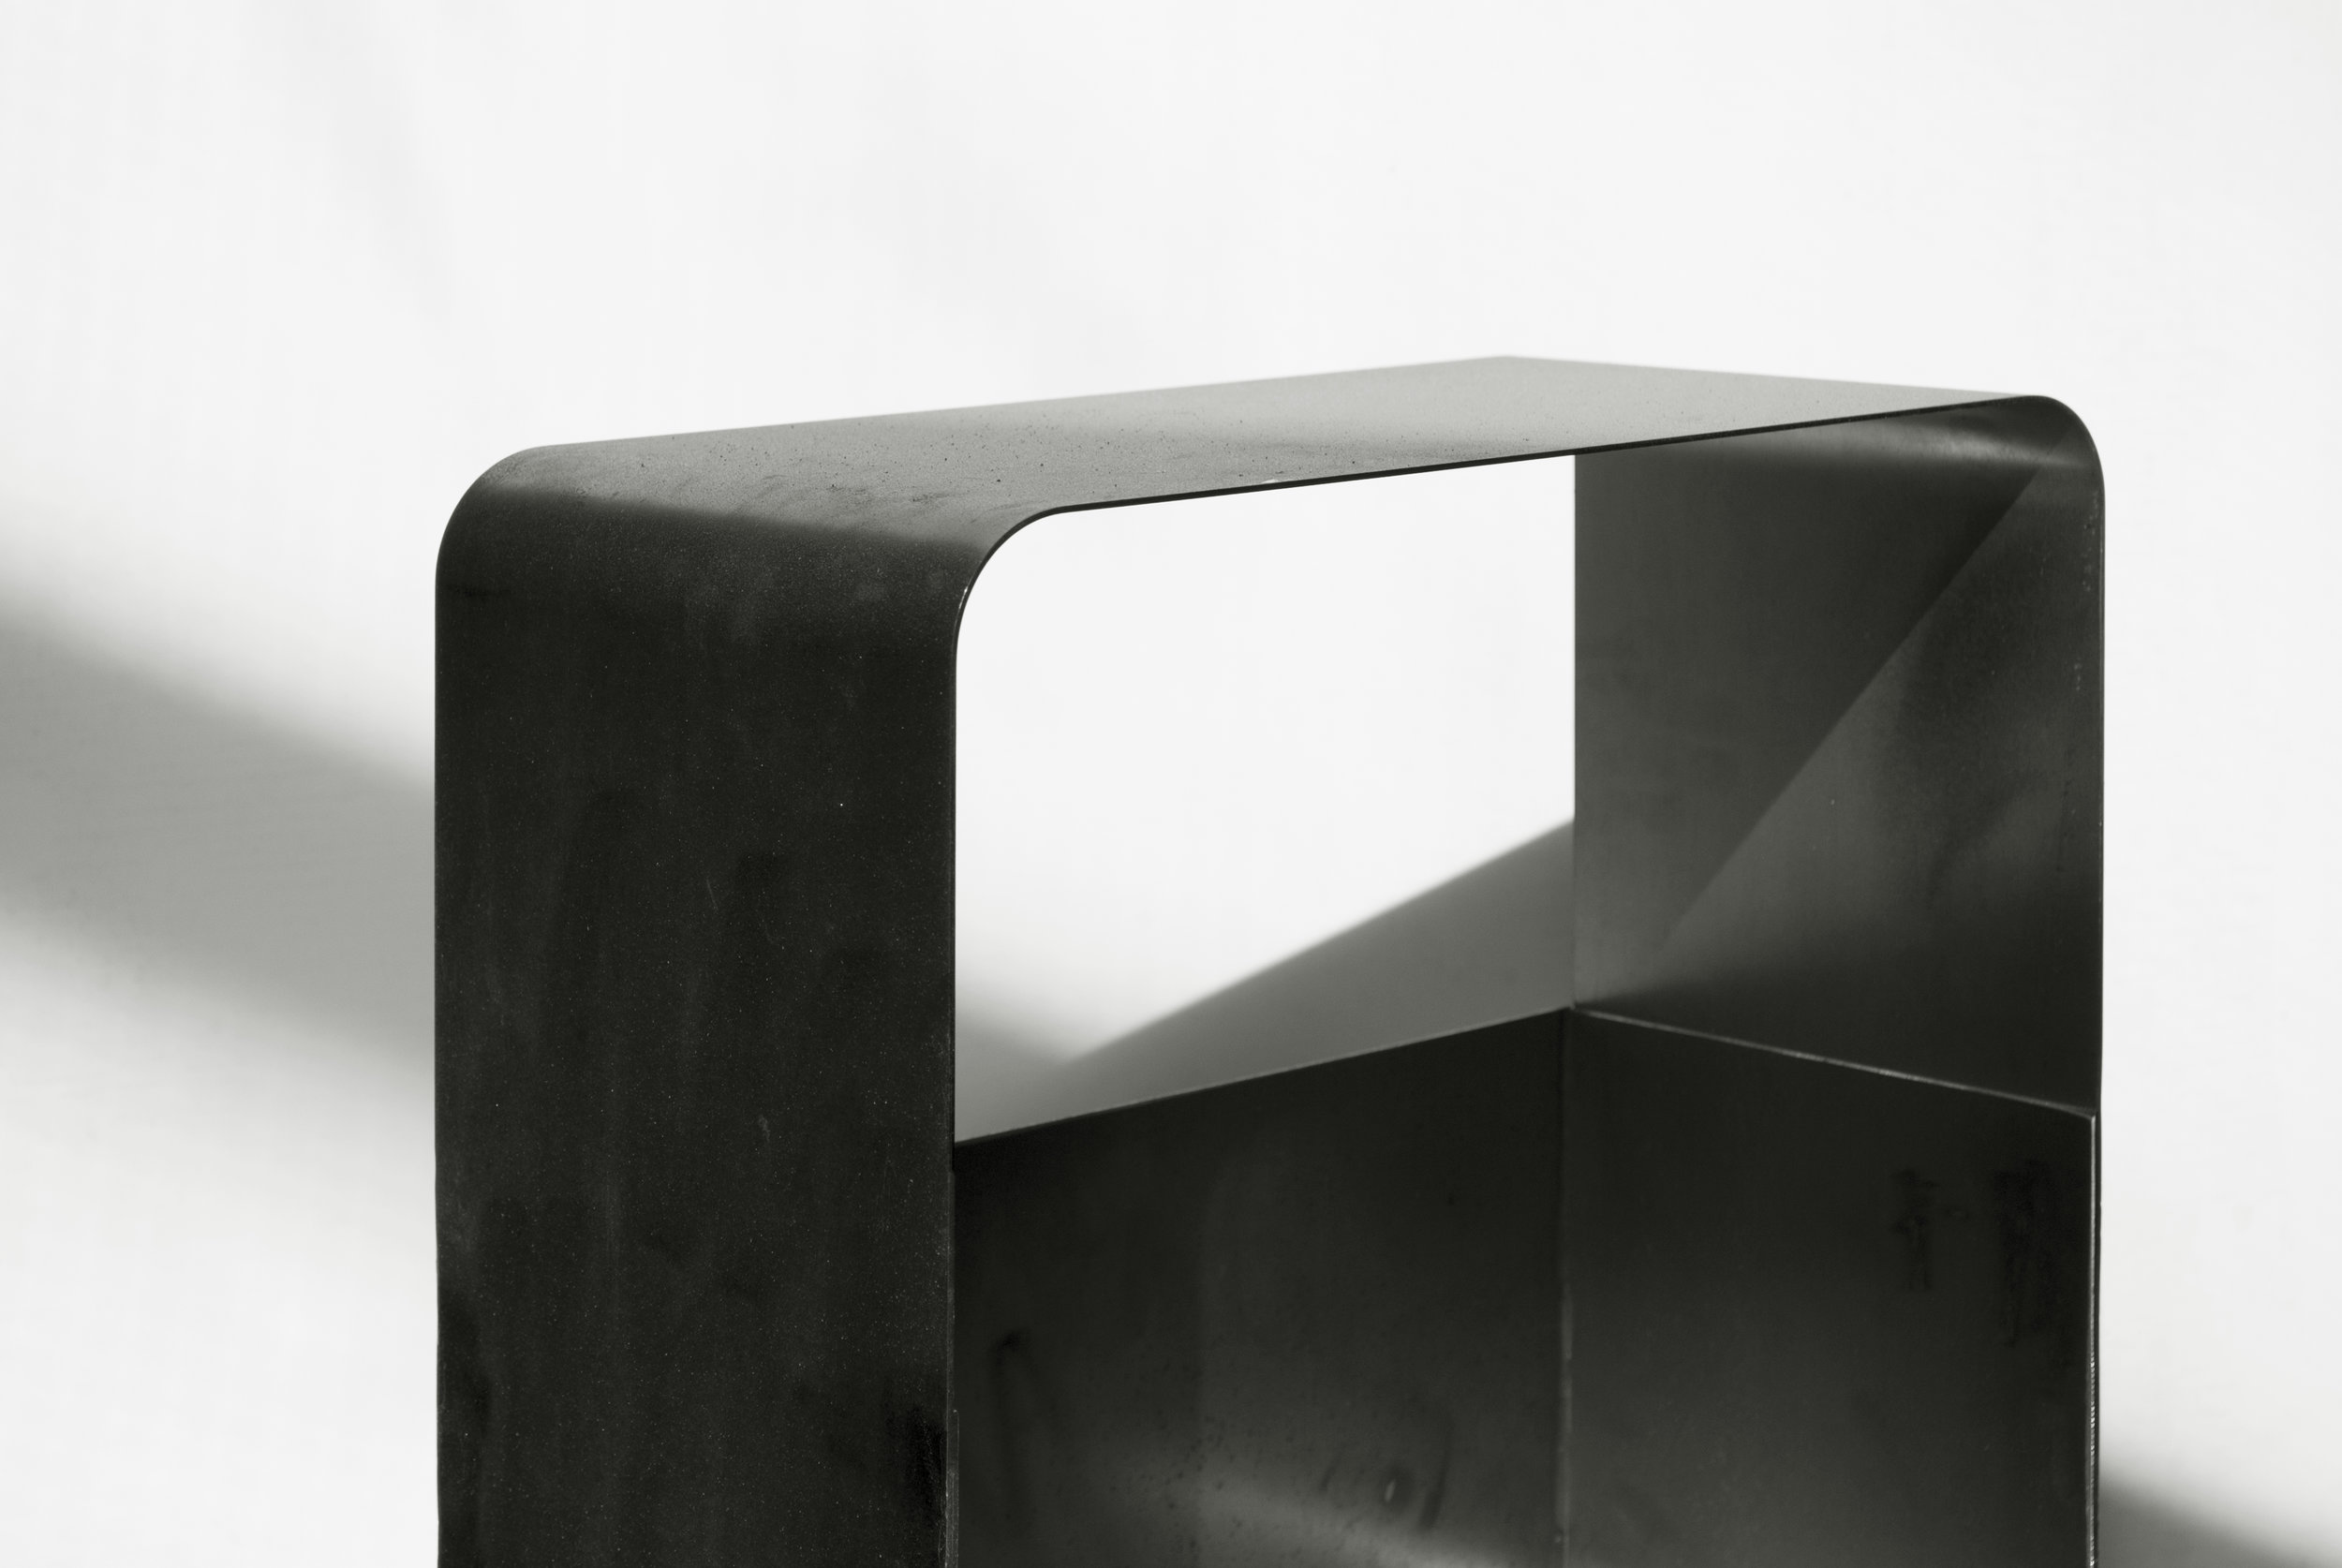 Mig welding // Wall crate